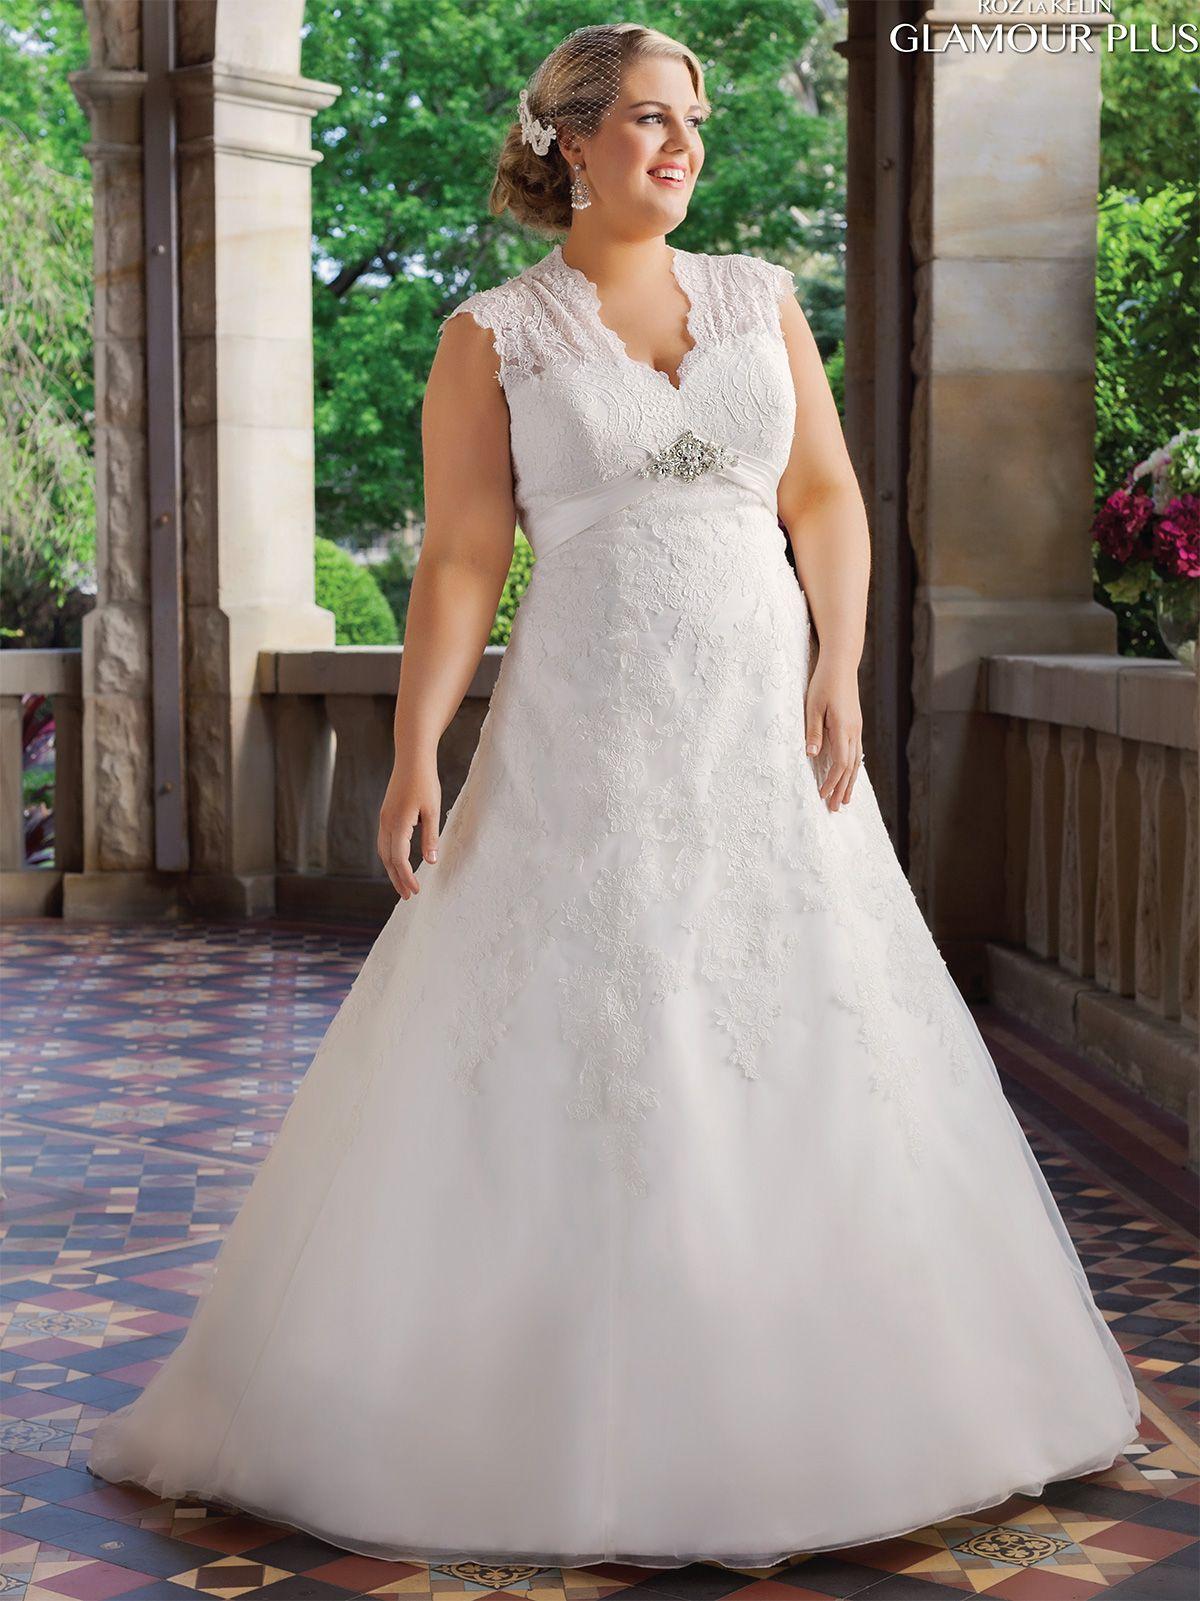 Rozlakelin plus size wedding gown beatrix dimitradesigns rozlakelin plus size wedding gown beatrix dimitradesigns sleeves ombrellifo Images